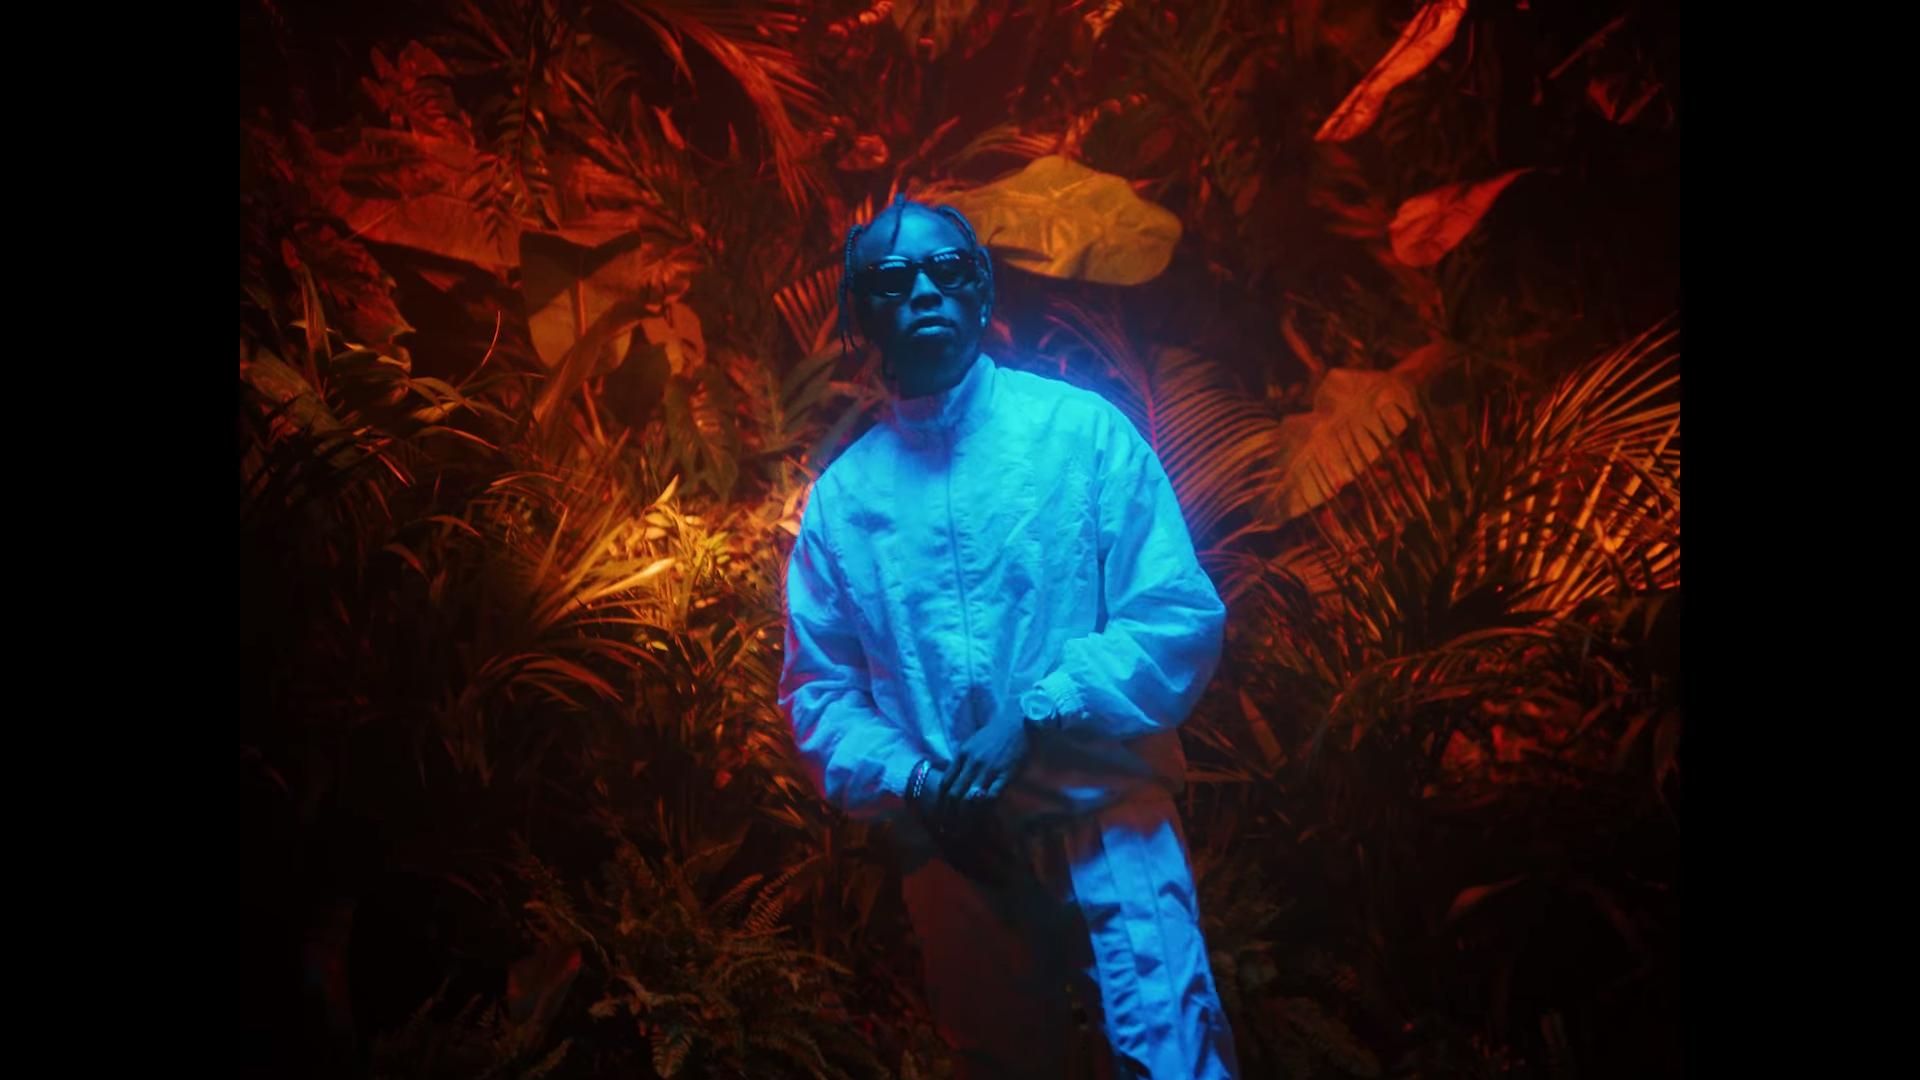 Popcaan - Body So Good (Official Video) 1-16 screenshot